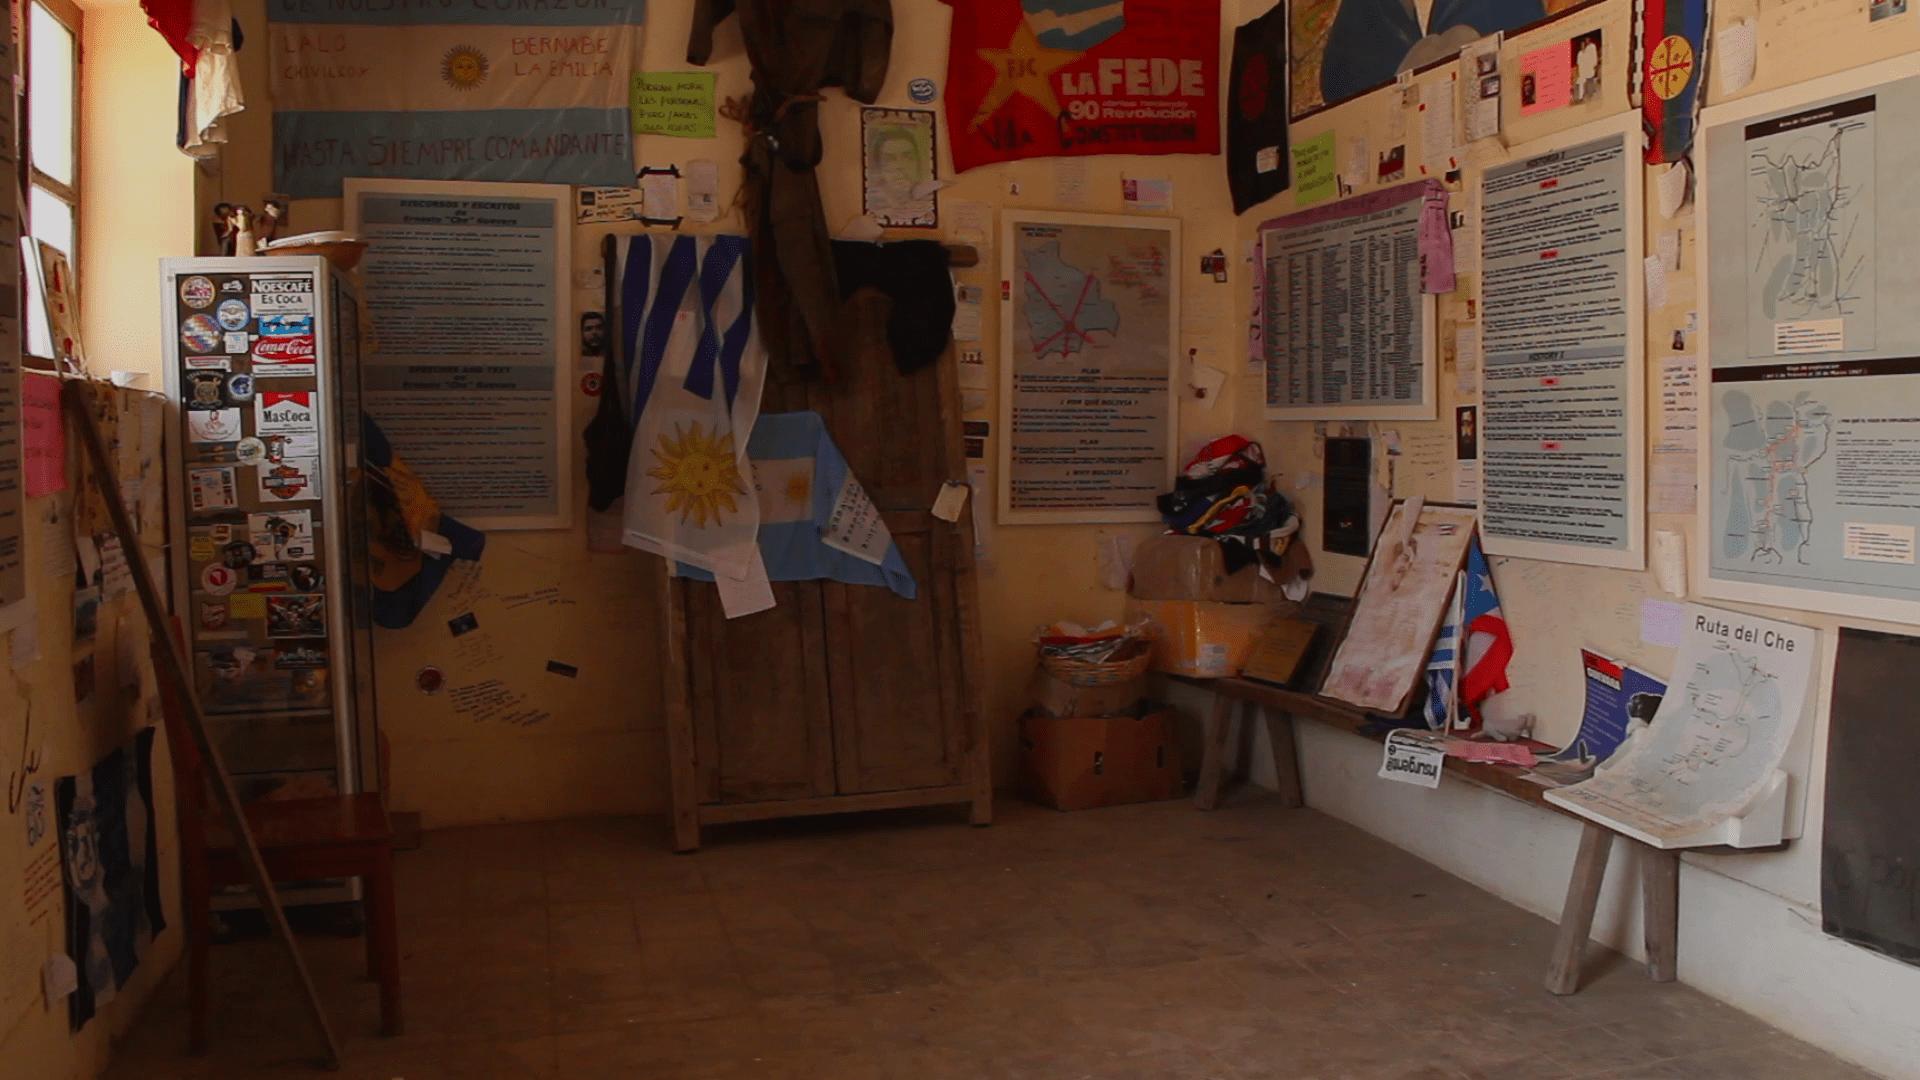 escuela higuera pablocaminante - Ruta del Che 2/2, La Higuera